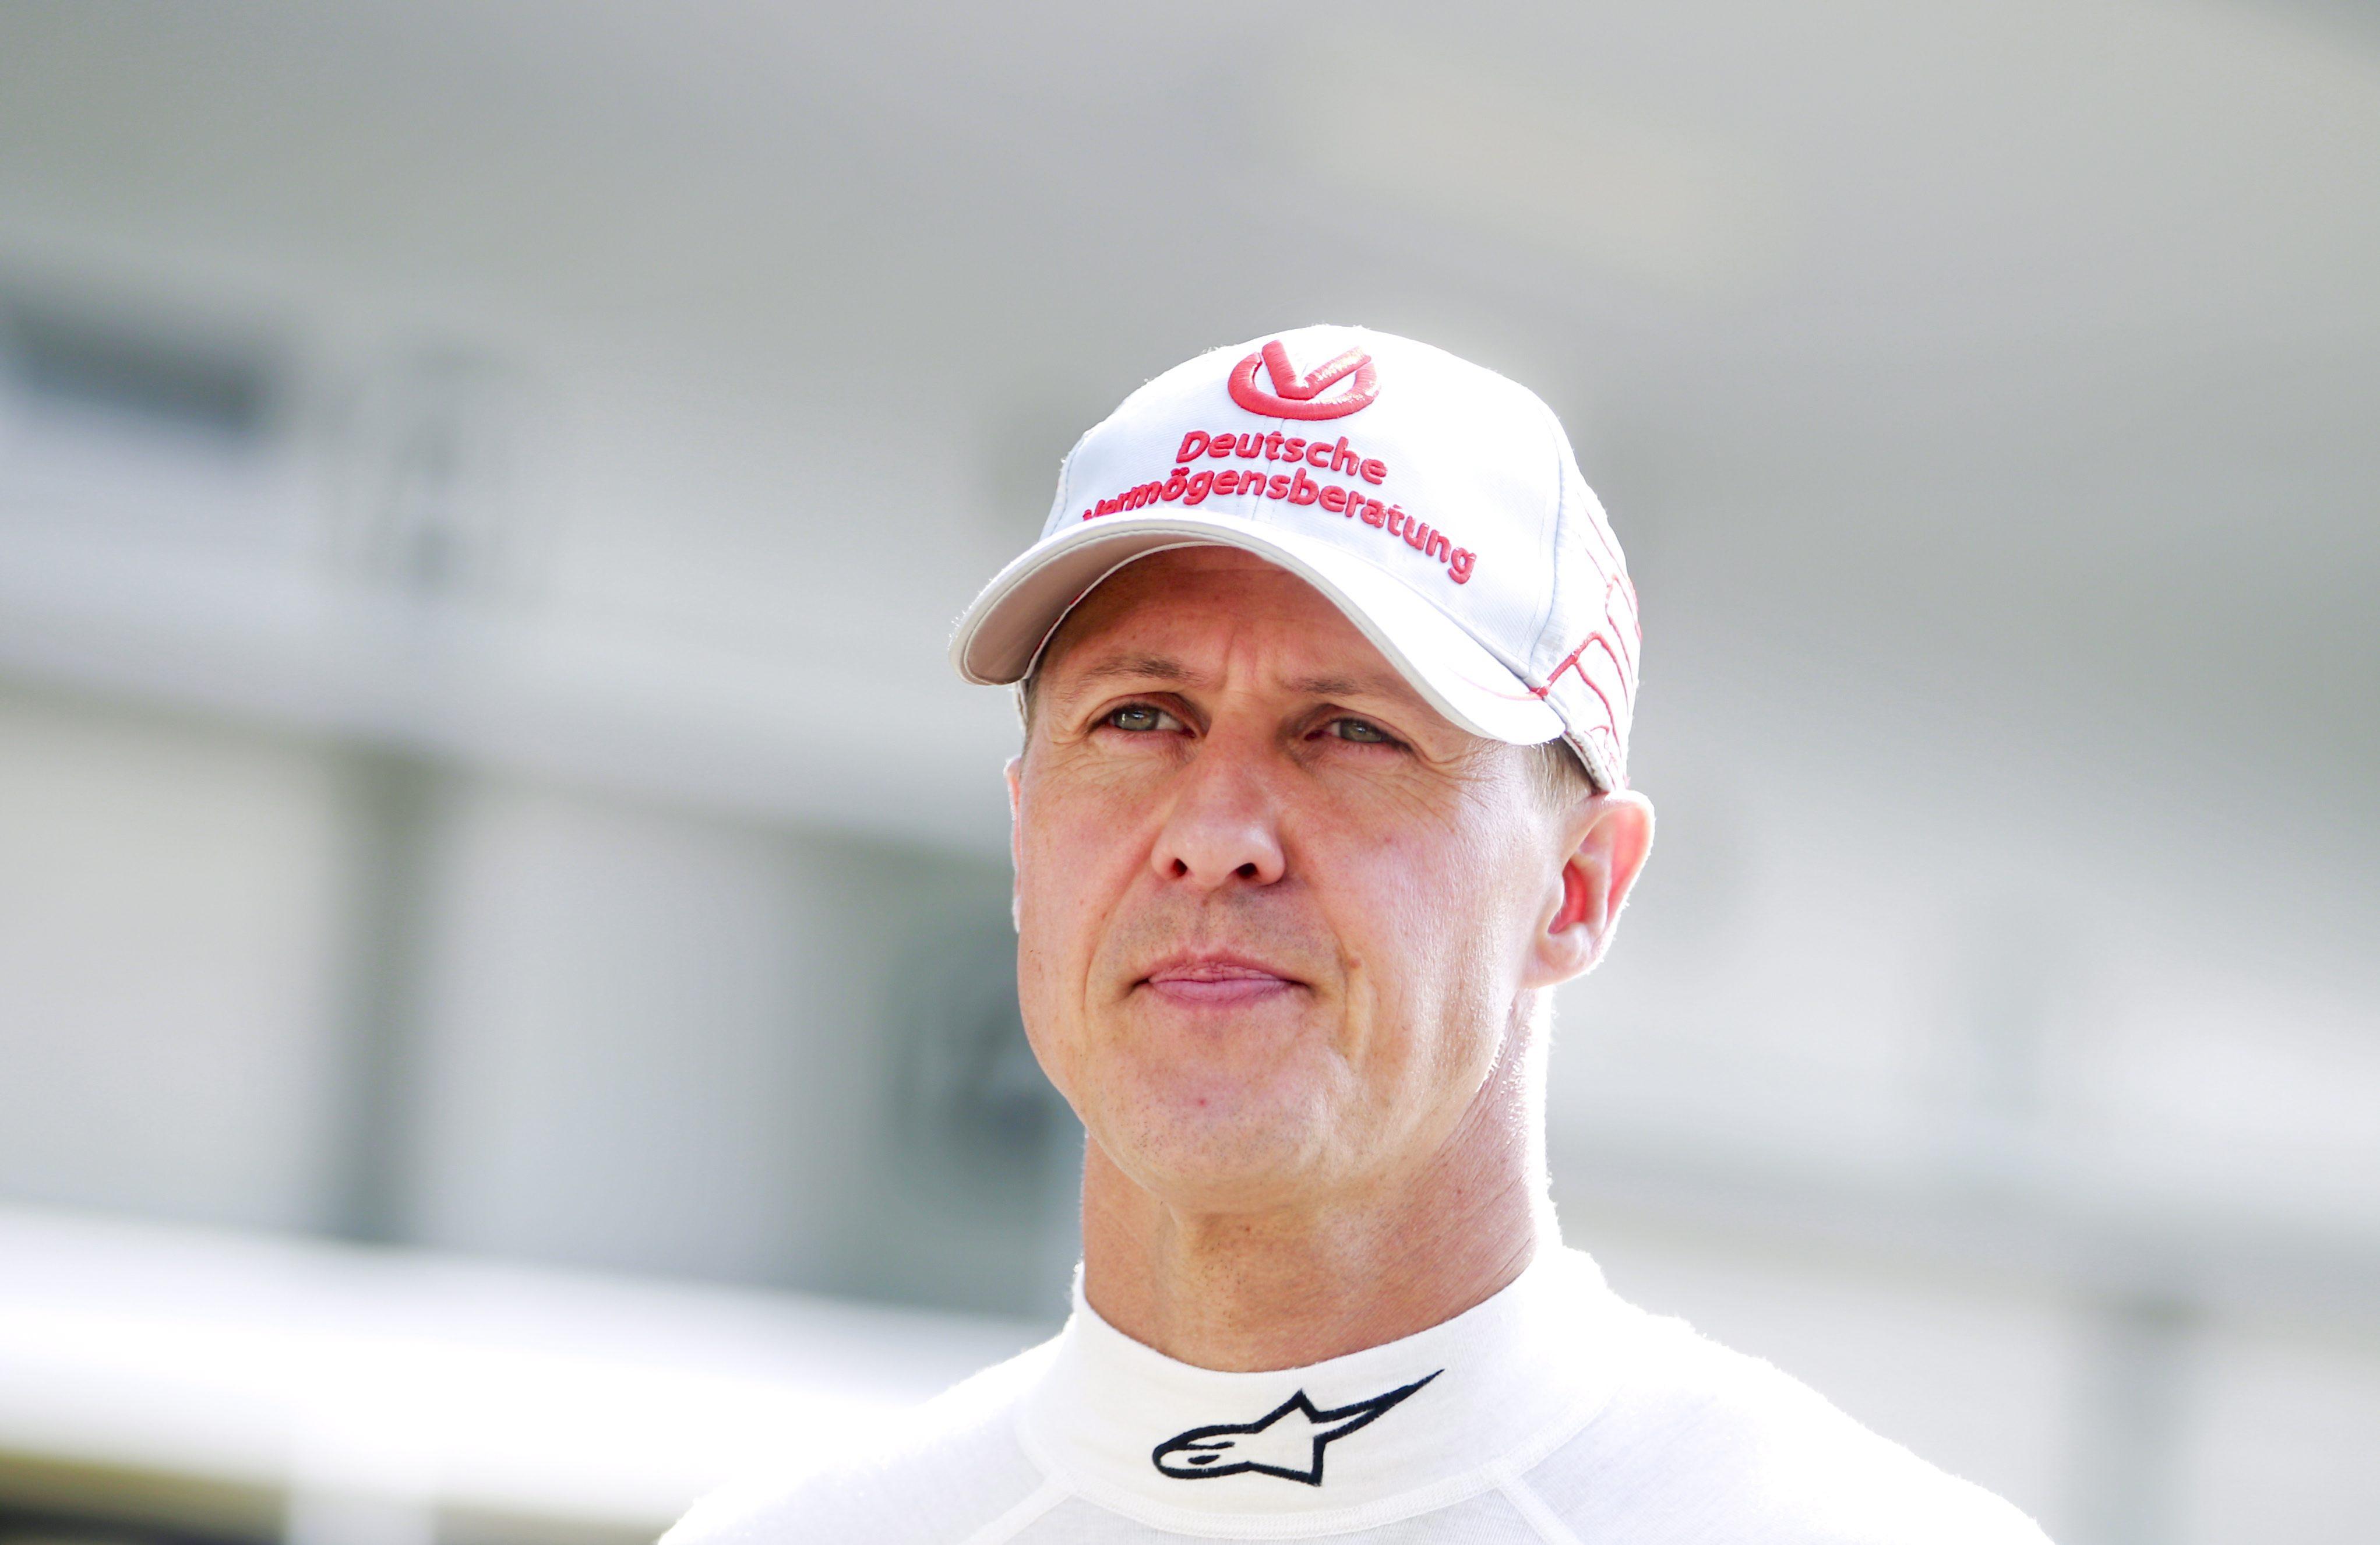 Пирели отговориха на нападките на Шумахер